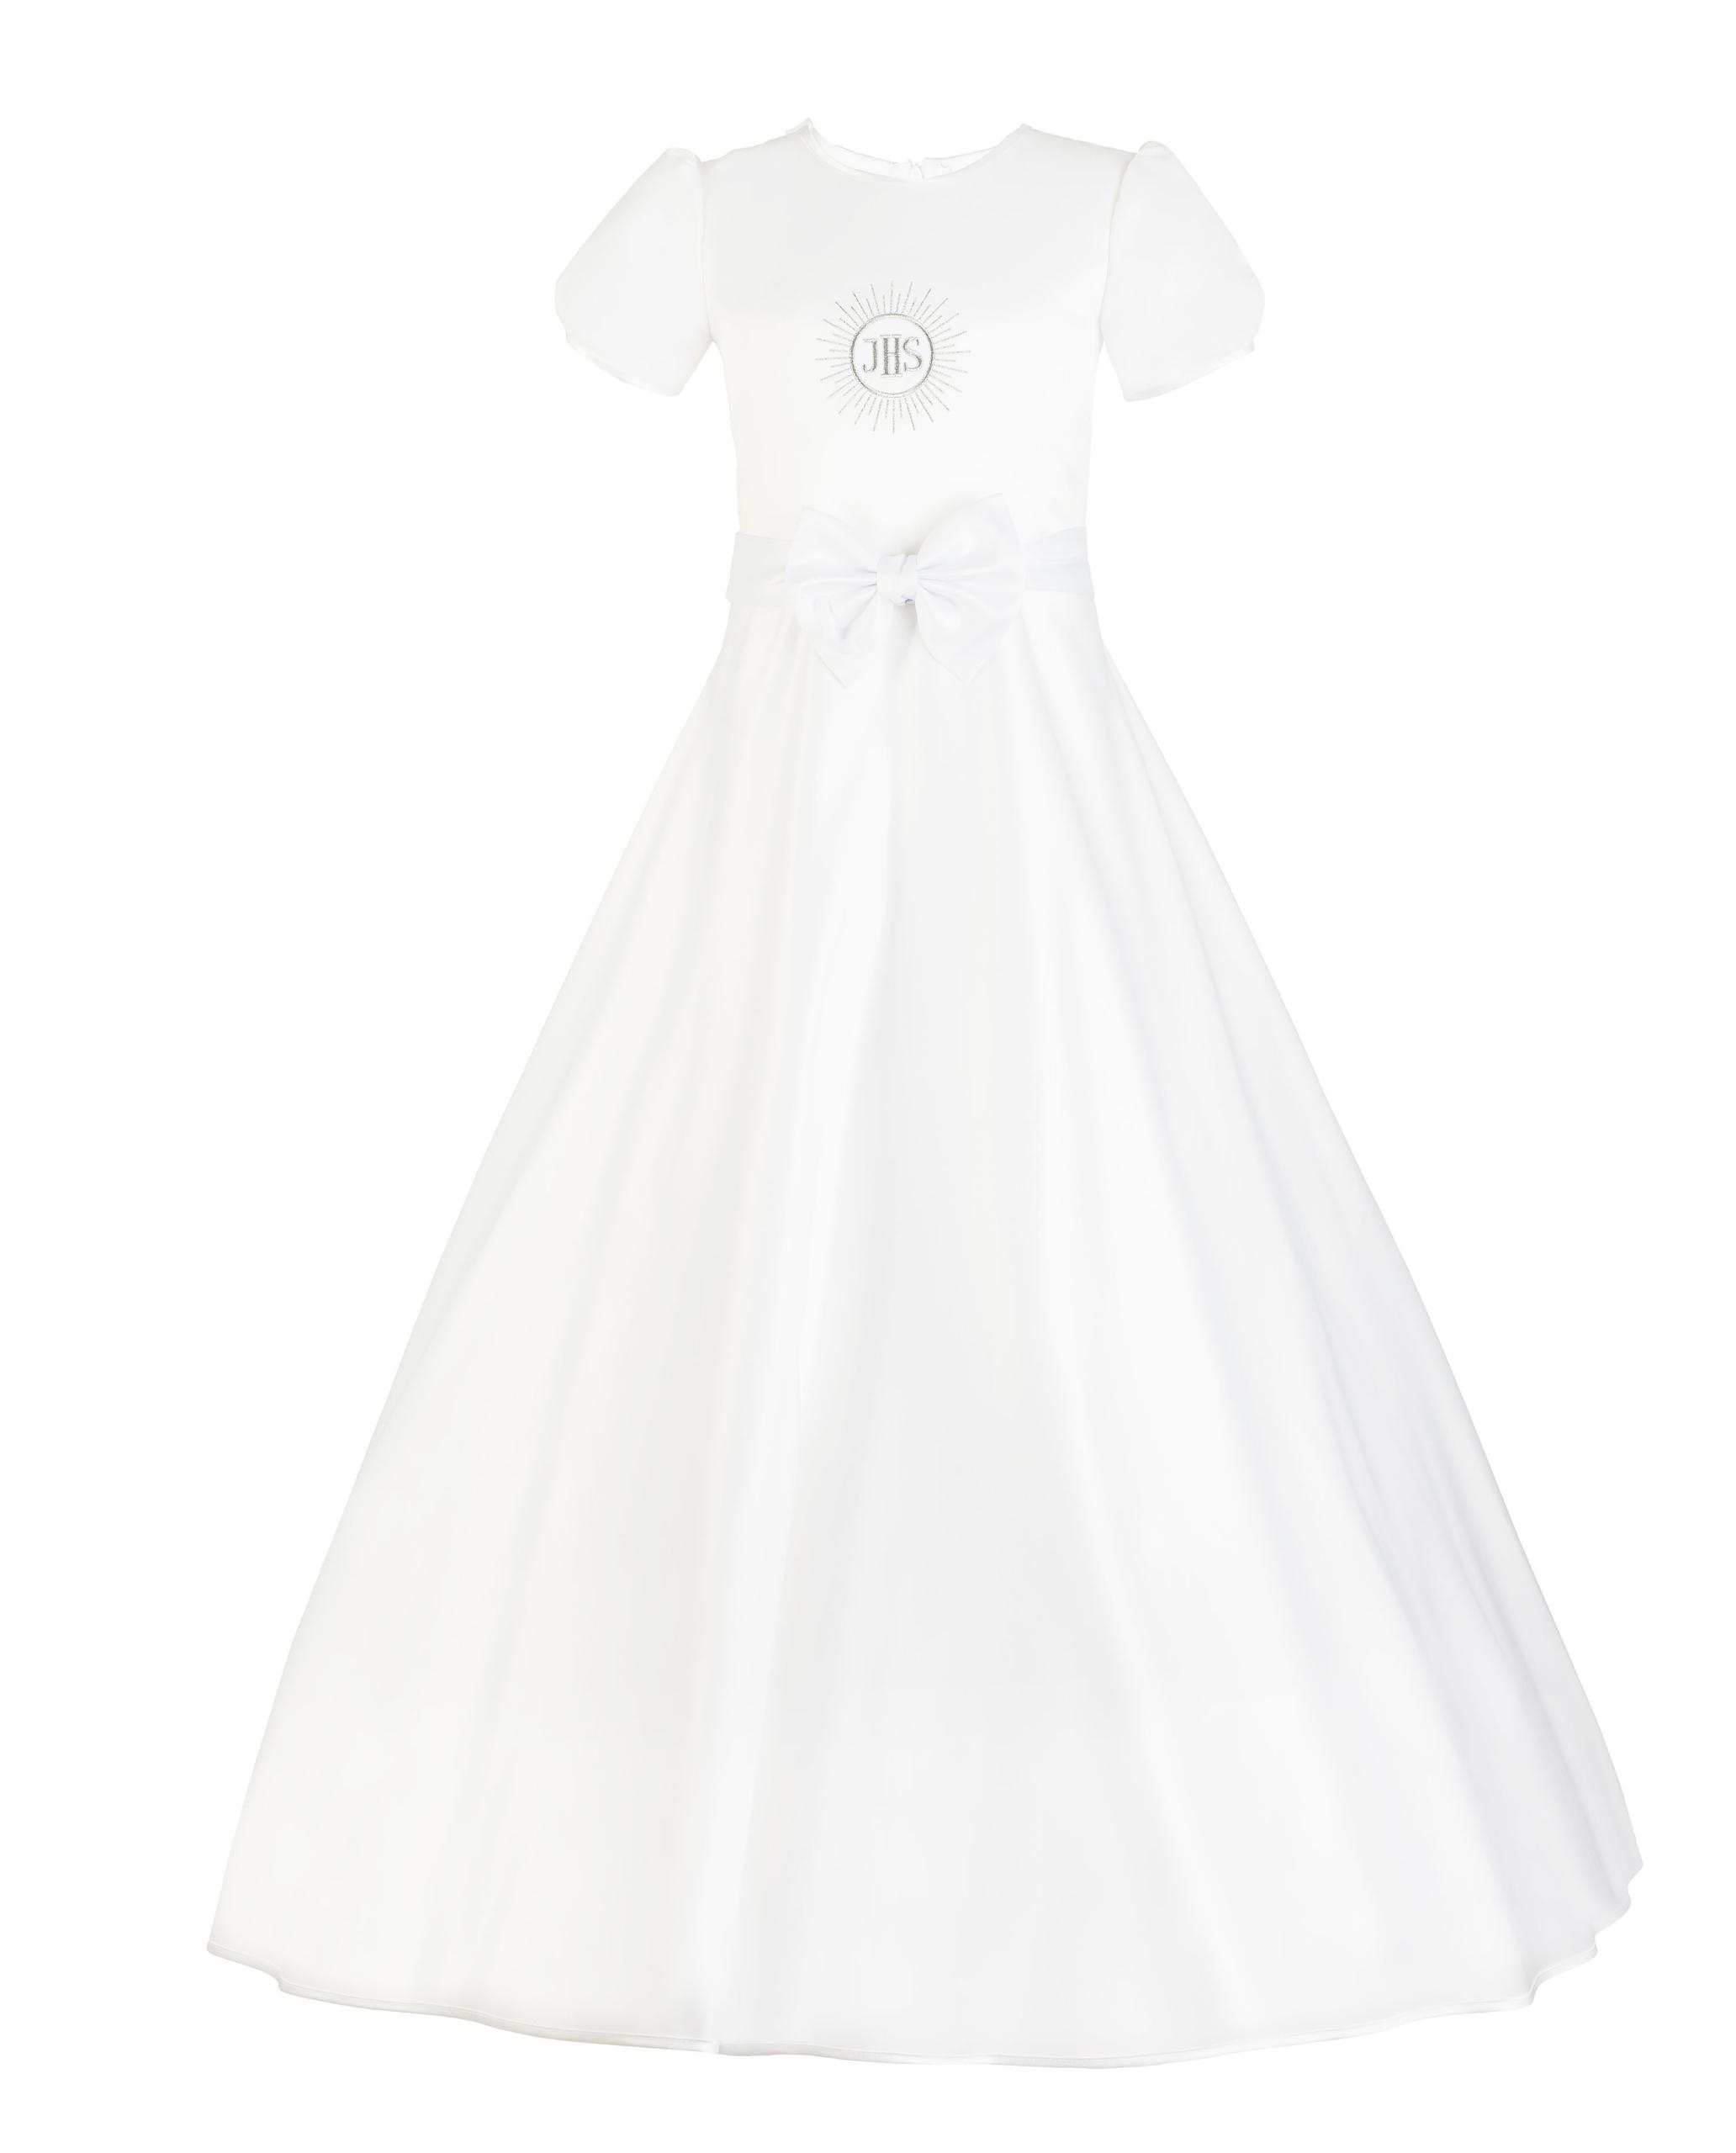 Sukienki Komunijne Sukienka Na Komunie Alba 134 8867880254 Allegro Pl